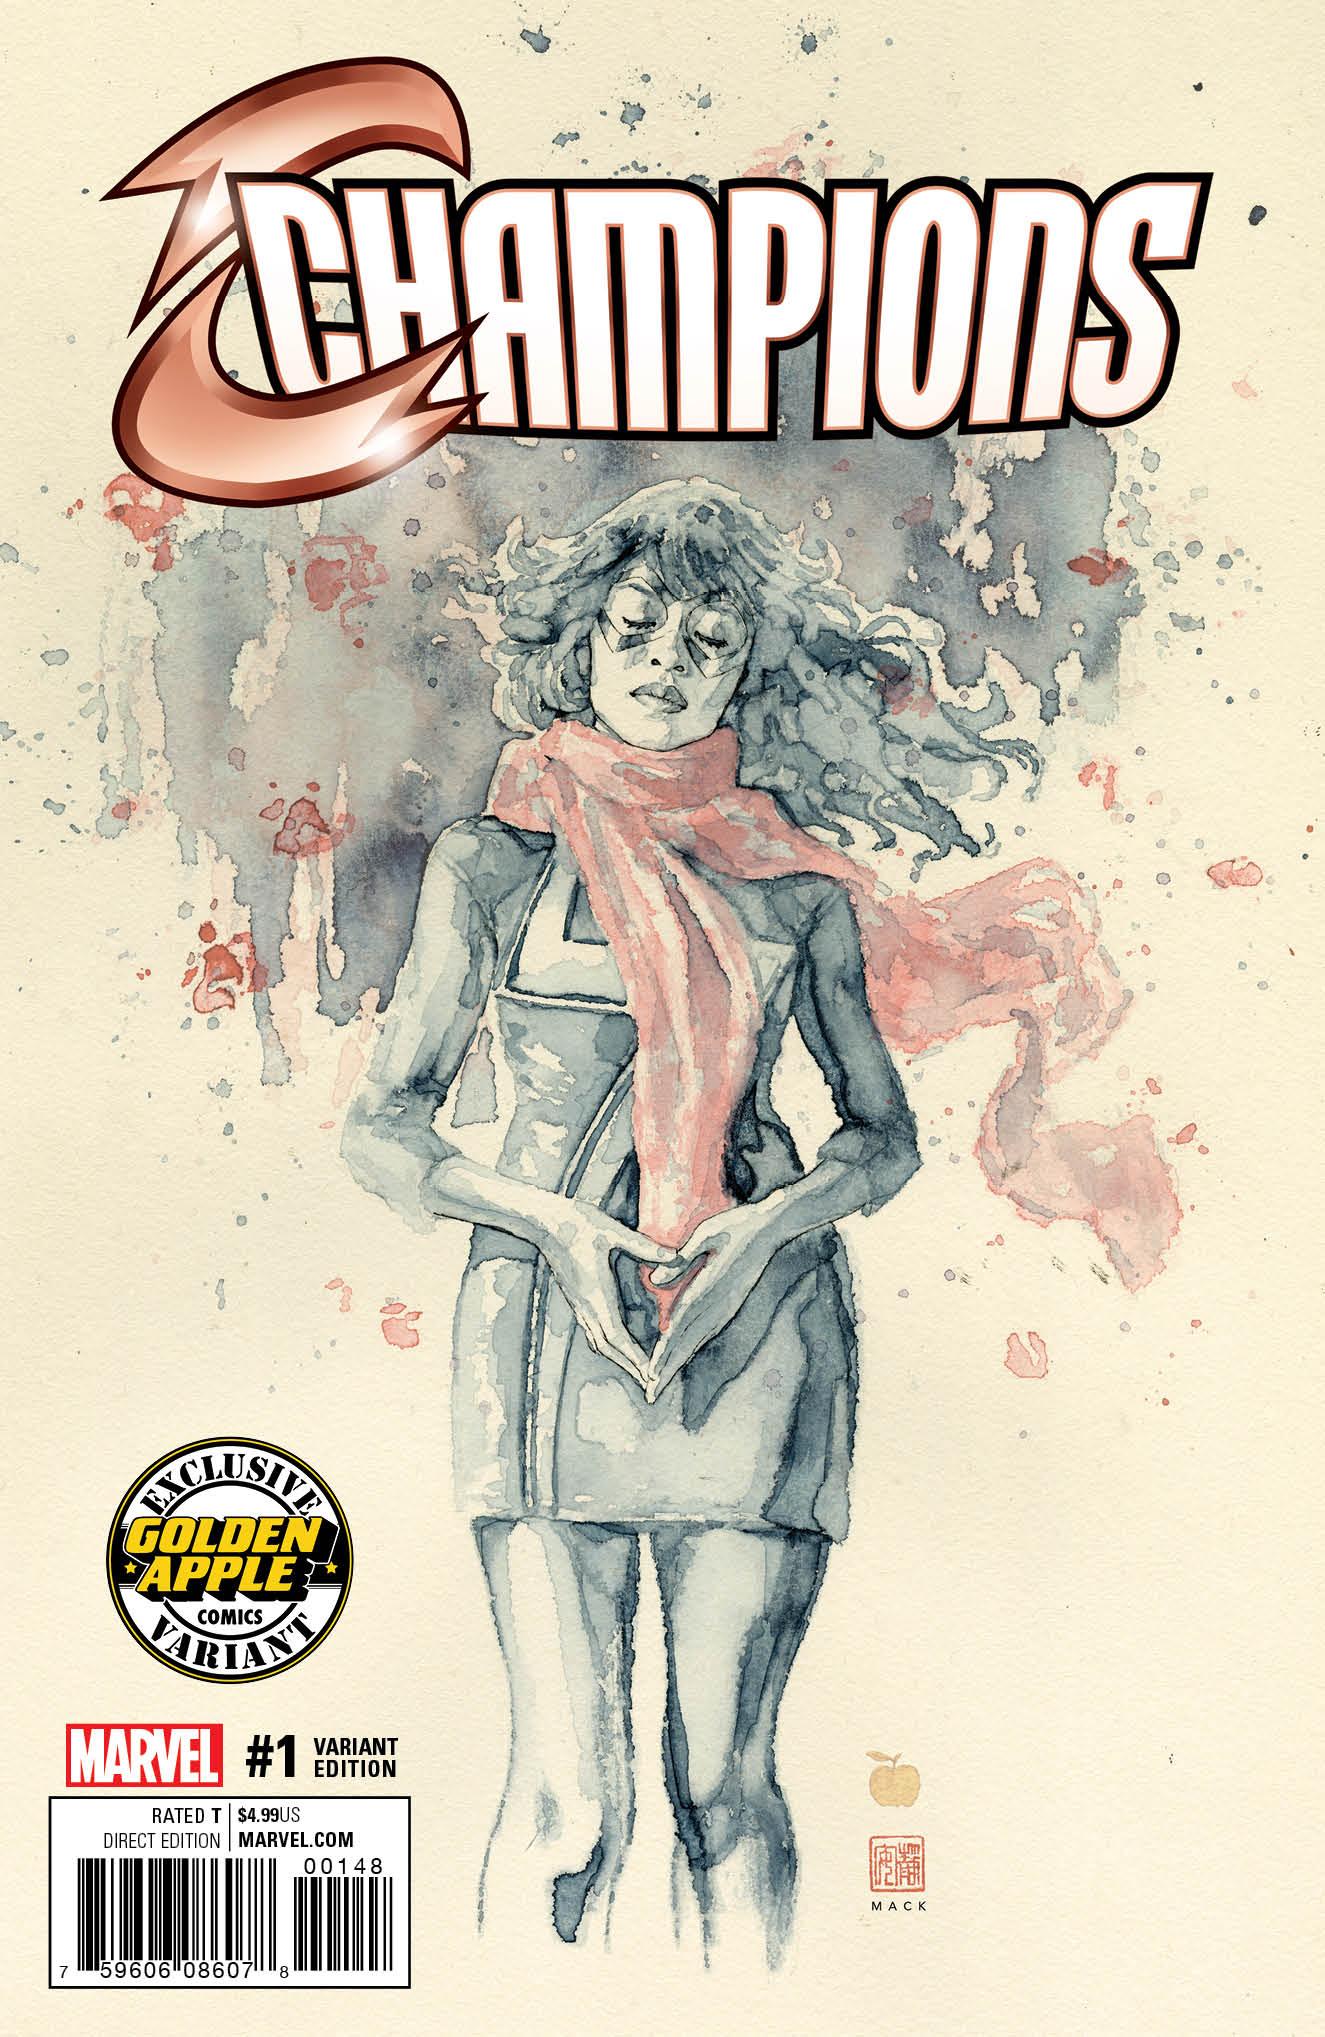 Champions Vol 2 1 Golden Apple Comics Exclusive Variant.jpg